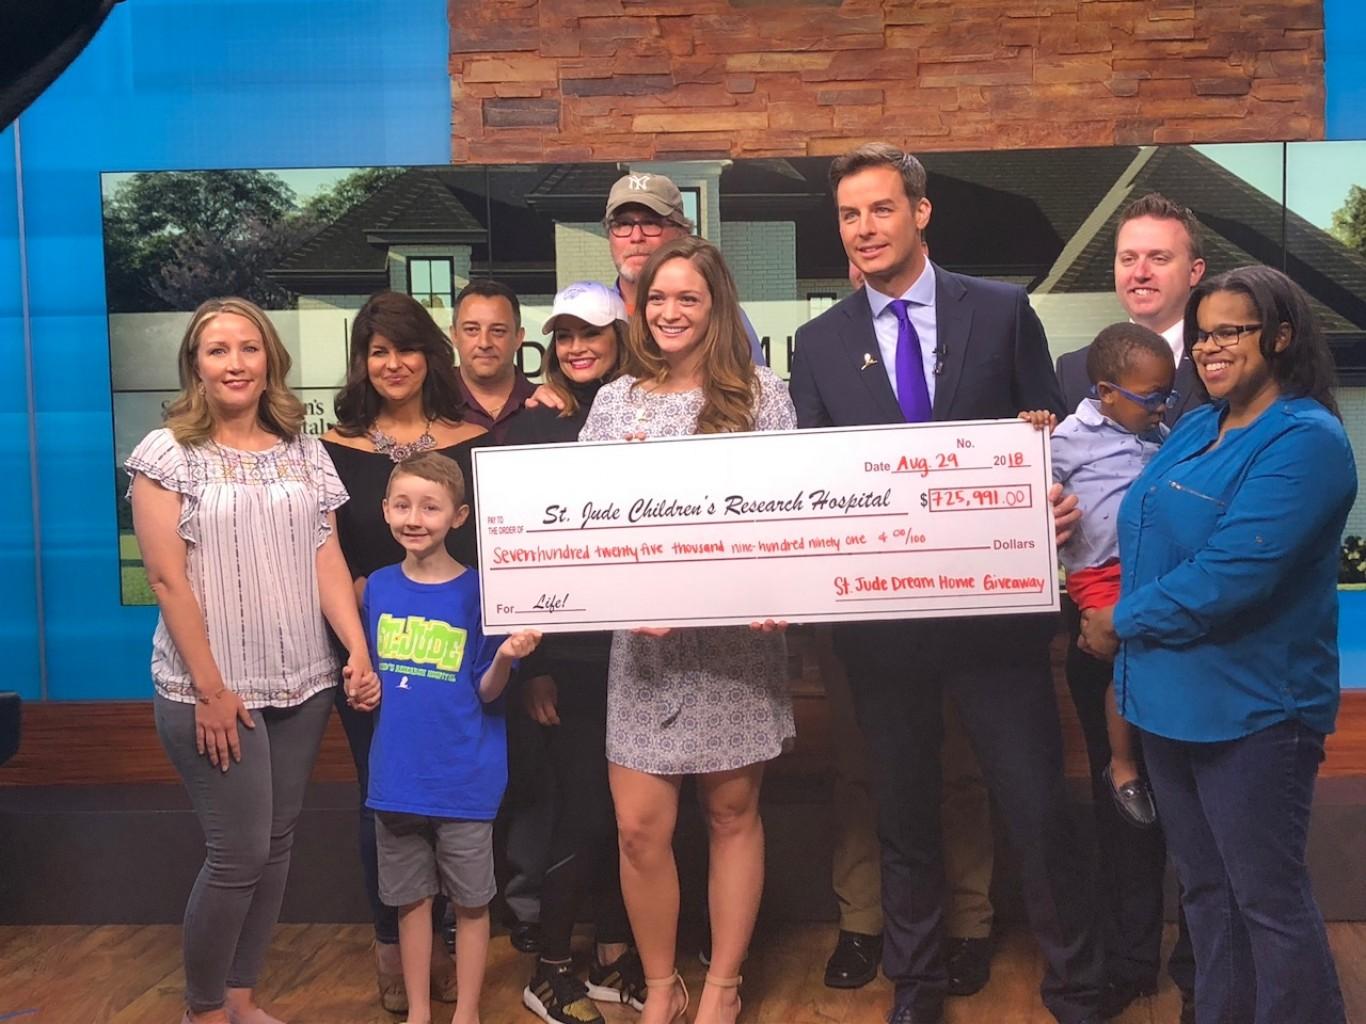 St Jude Children's Research Hospital celebra el ganador de Sorteo St. Jude Dream Home